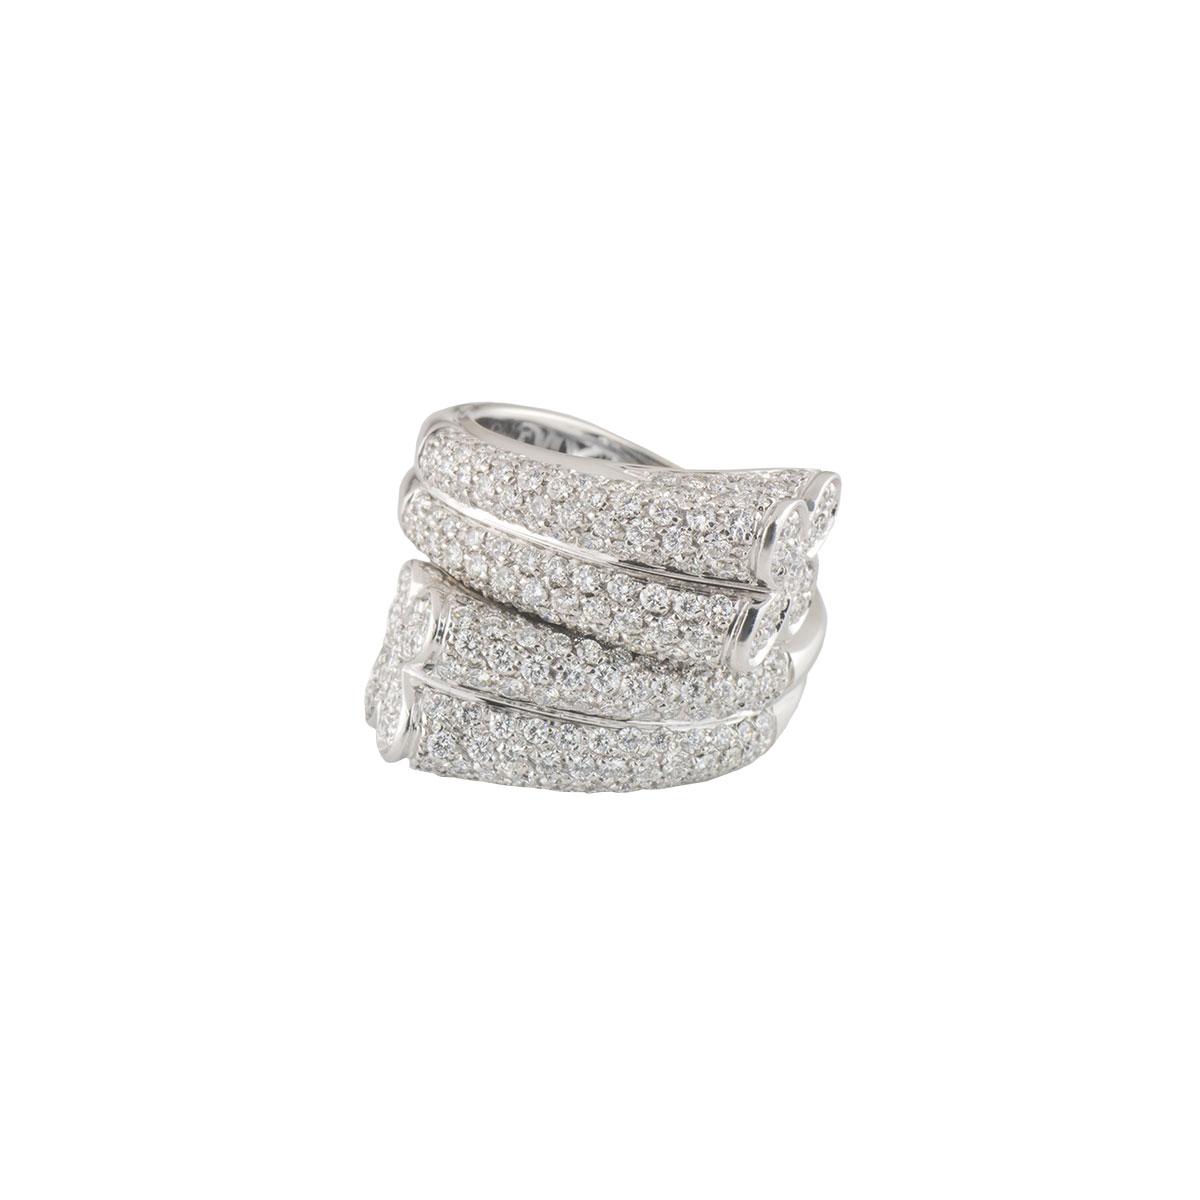 White GoldDiamond Ring 2.44ct G/VS